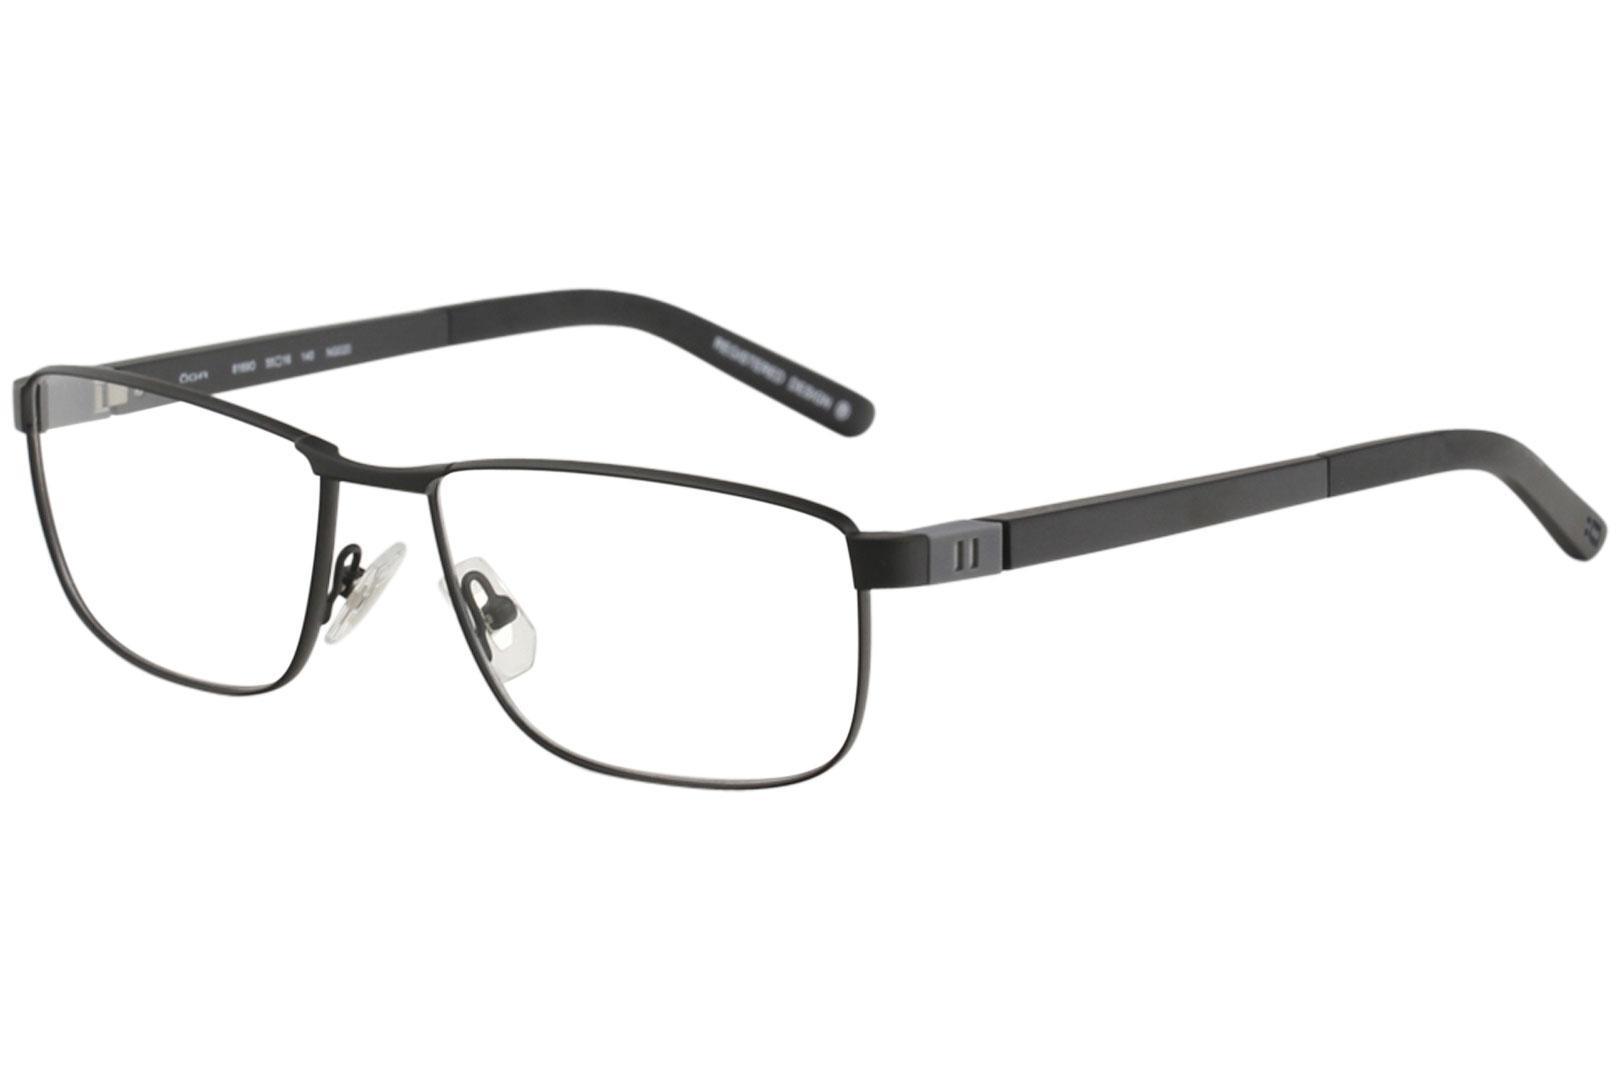 3b5ad4ce496a Morel Men's Eyeglasses OGA 8169O 8169/O Full Rim Optical Frame by Morel